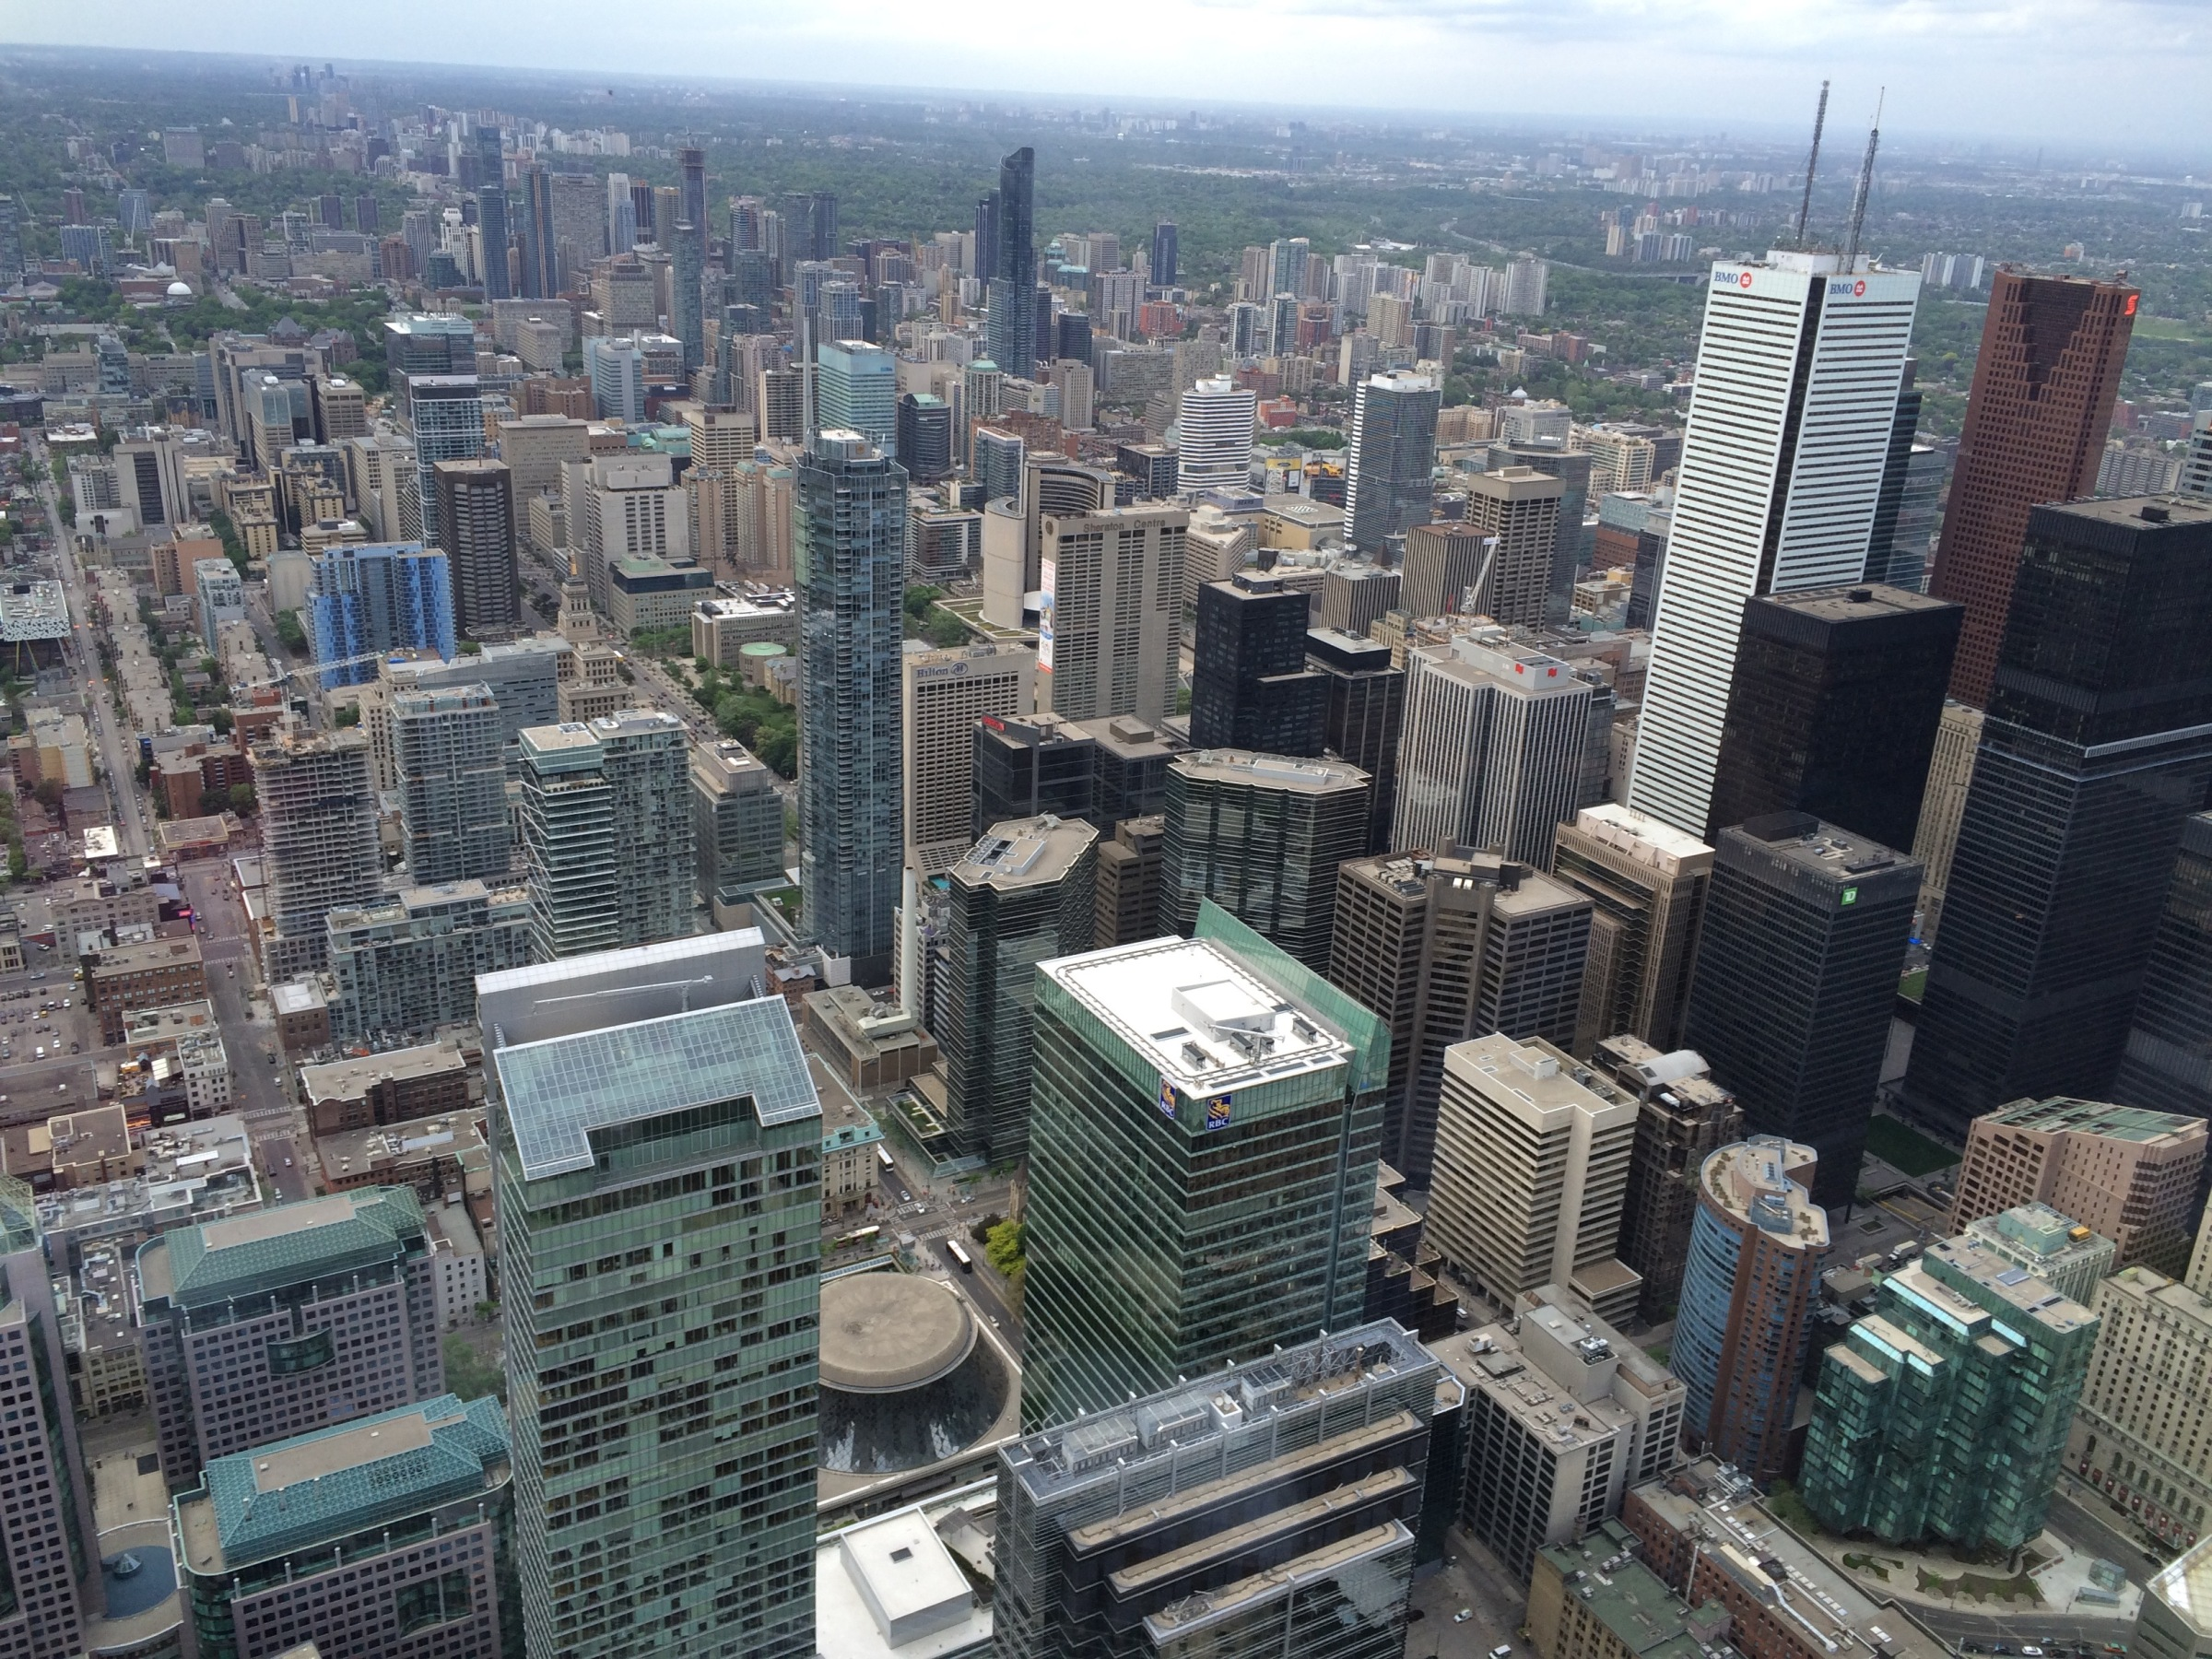 City of Toronto Skyview